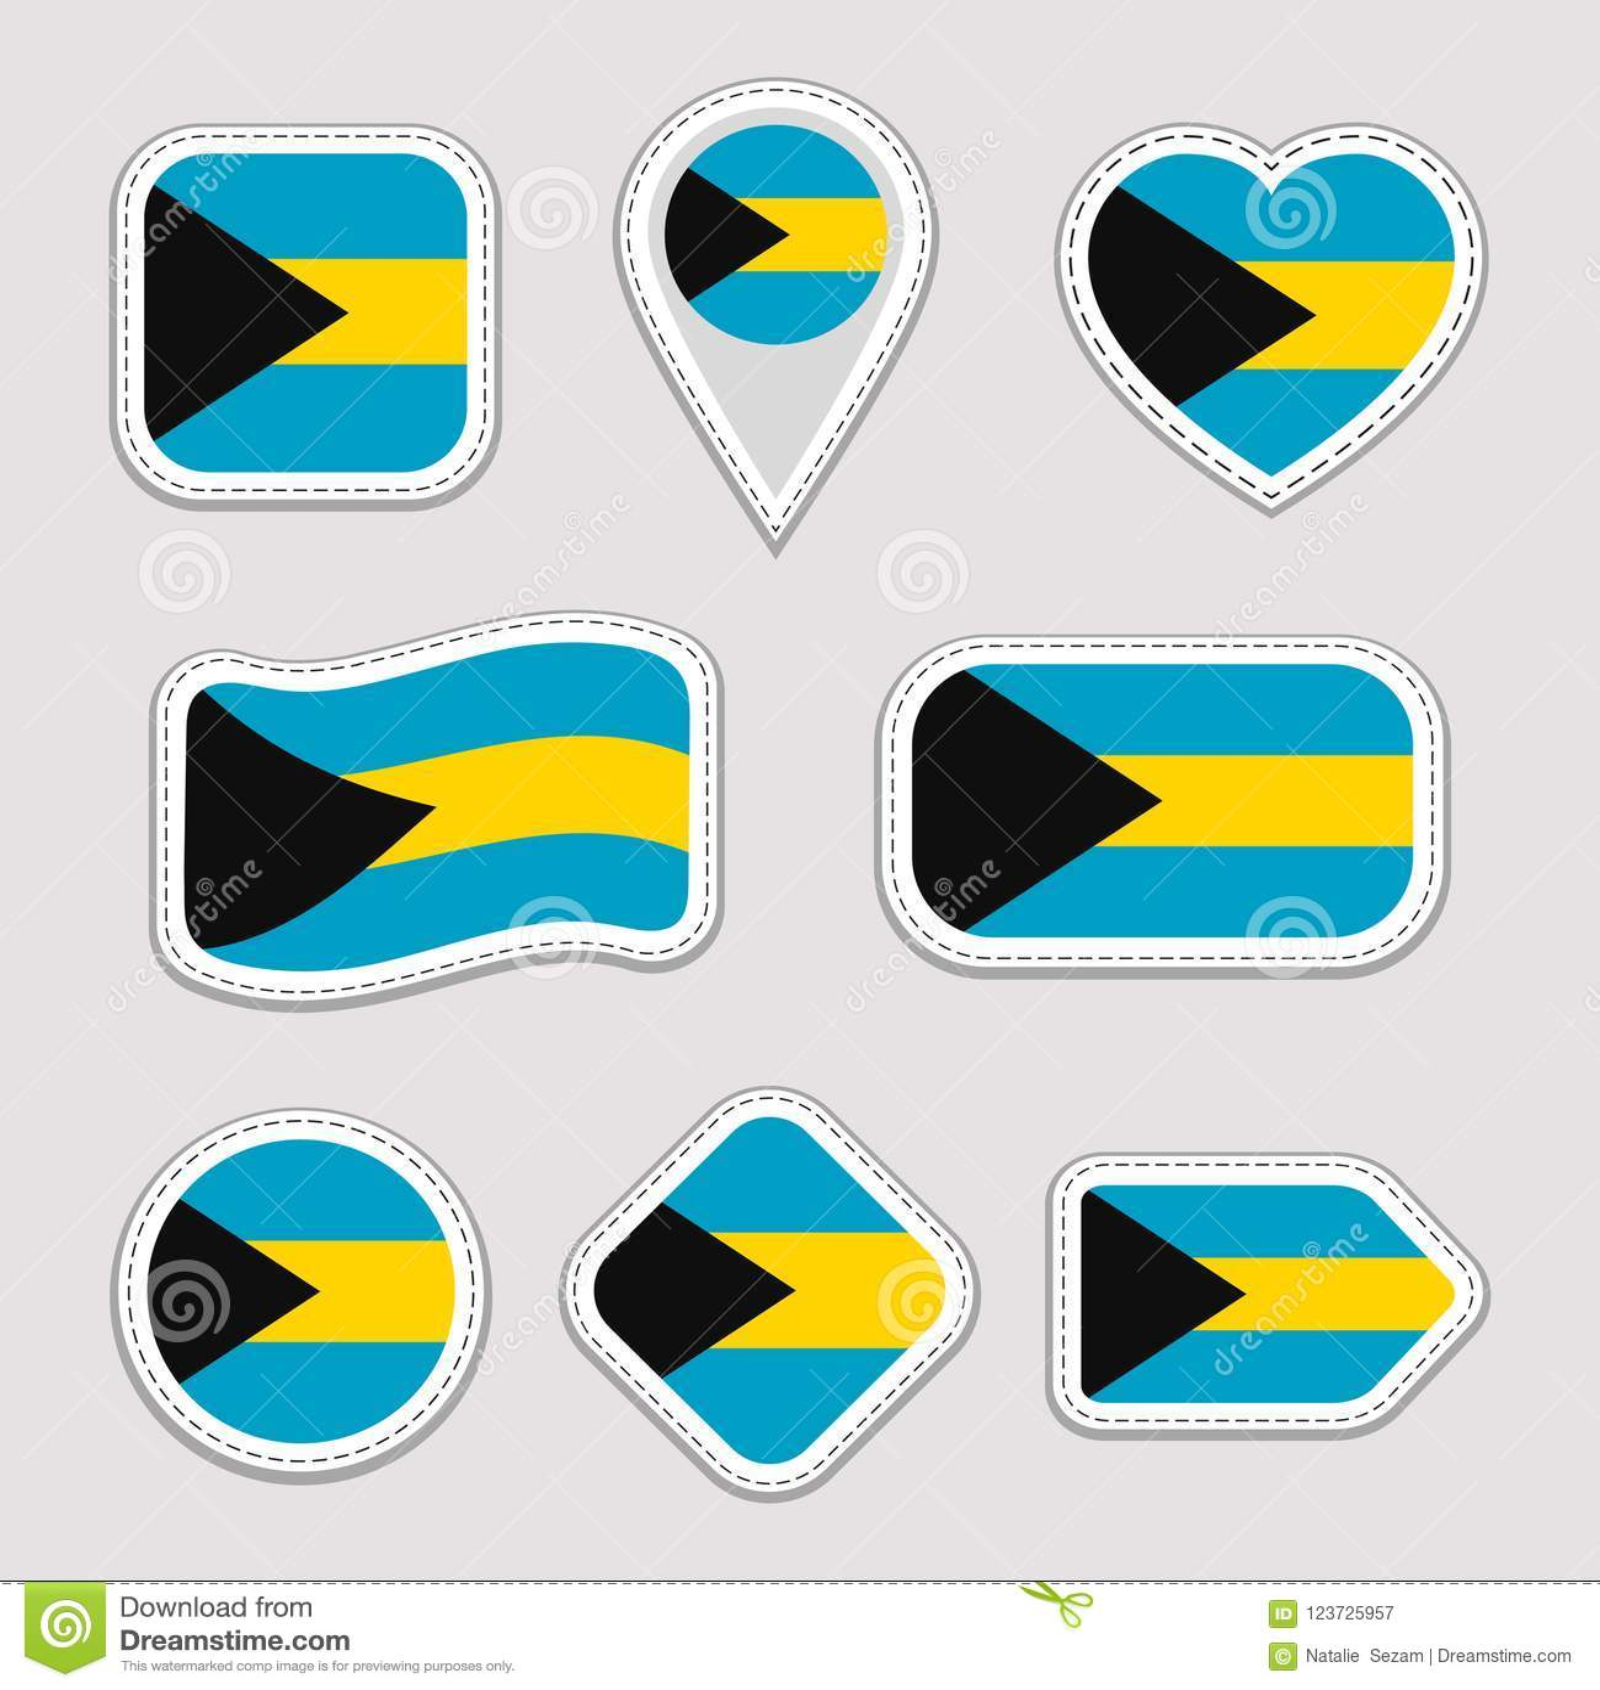 The Bahamas Flag Vector Set Bahamian Flags Stickers